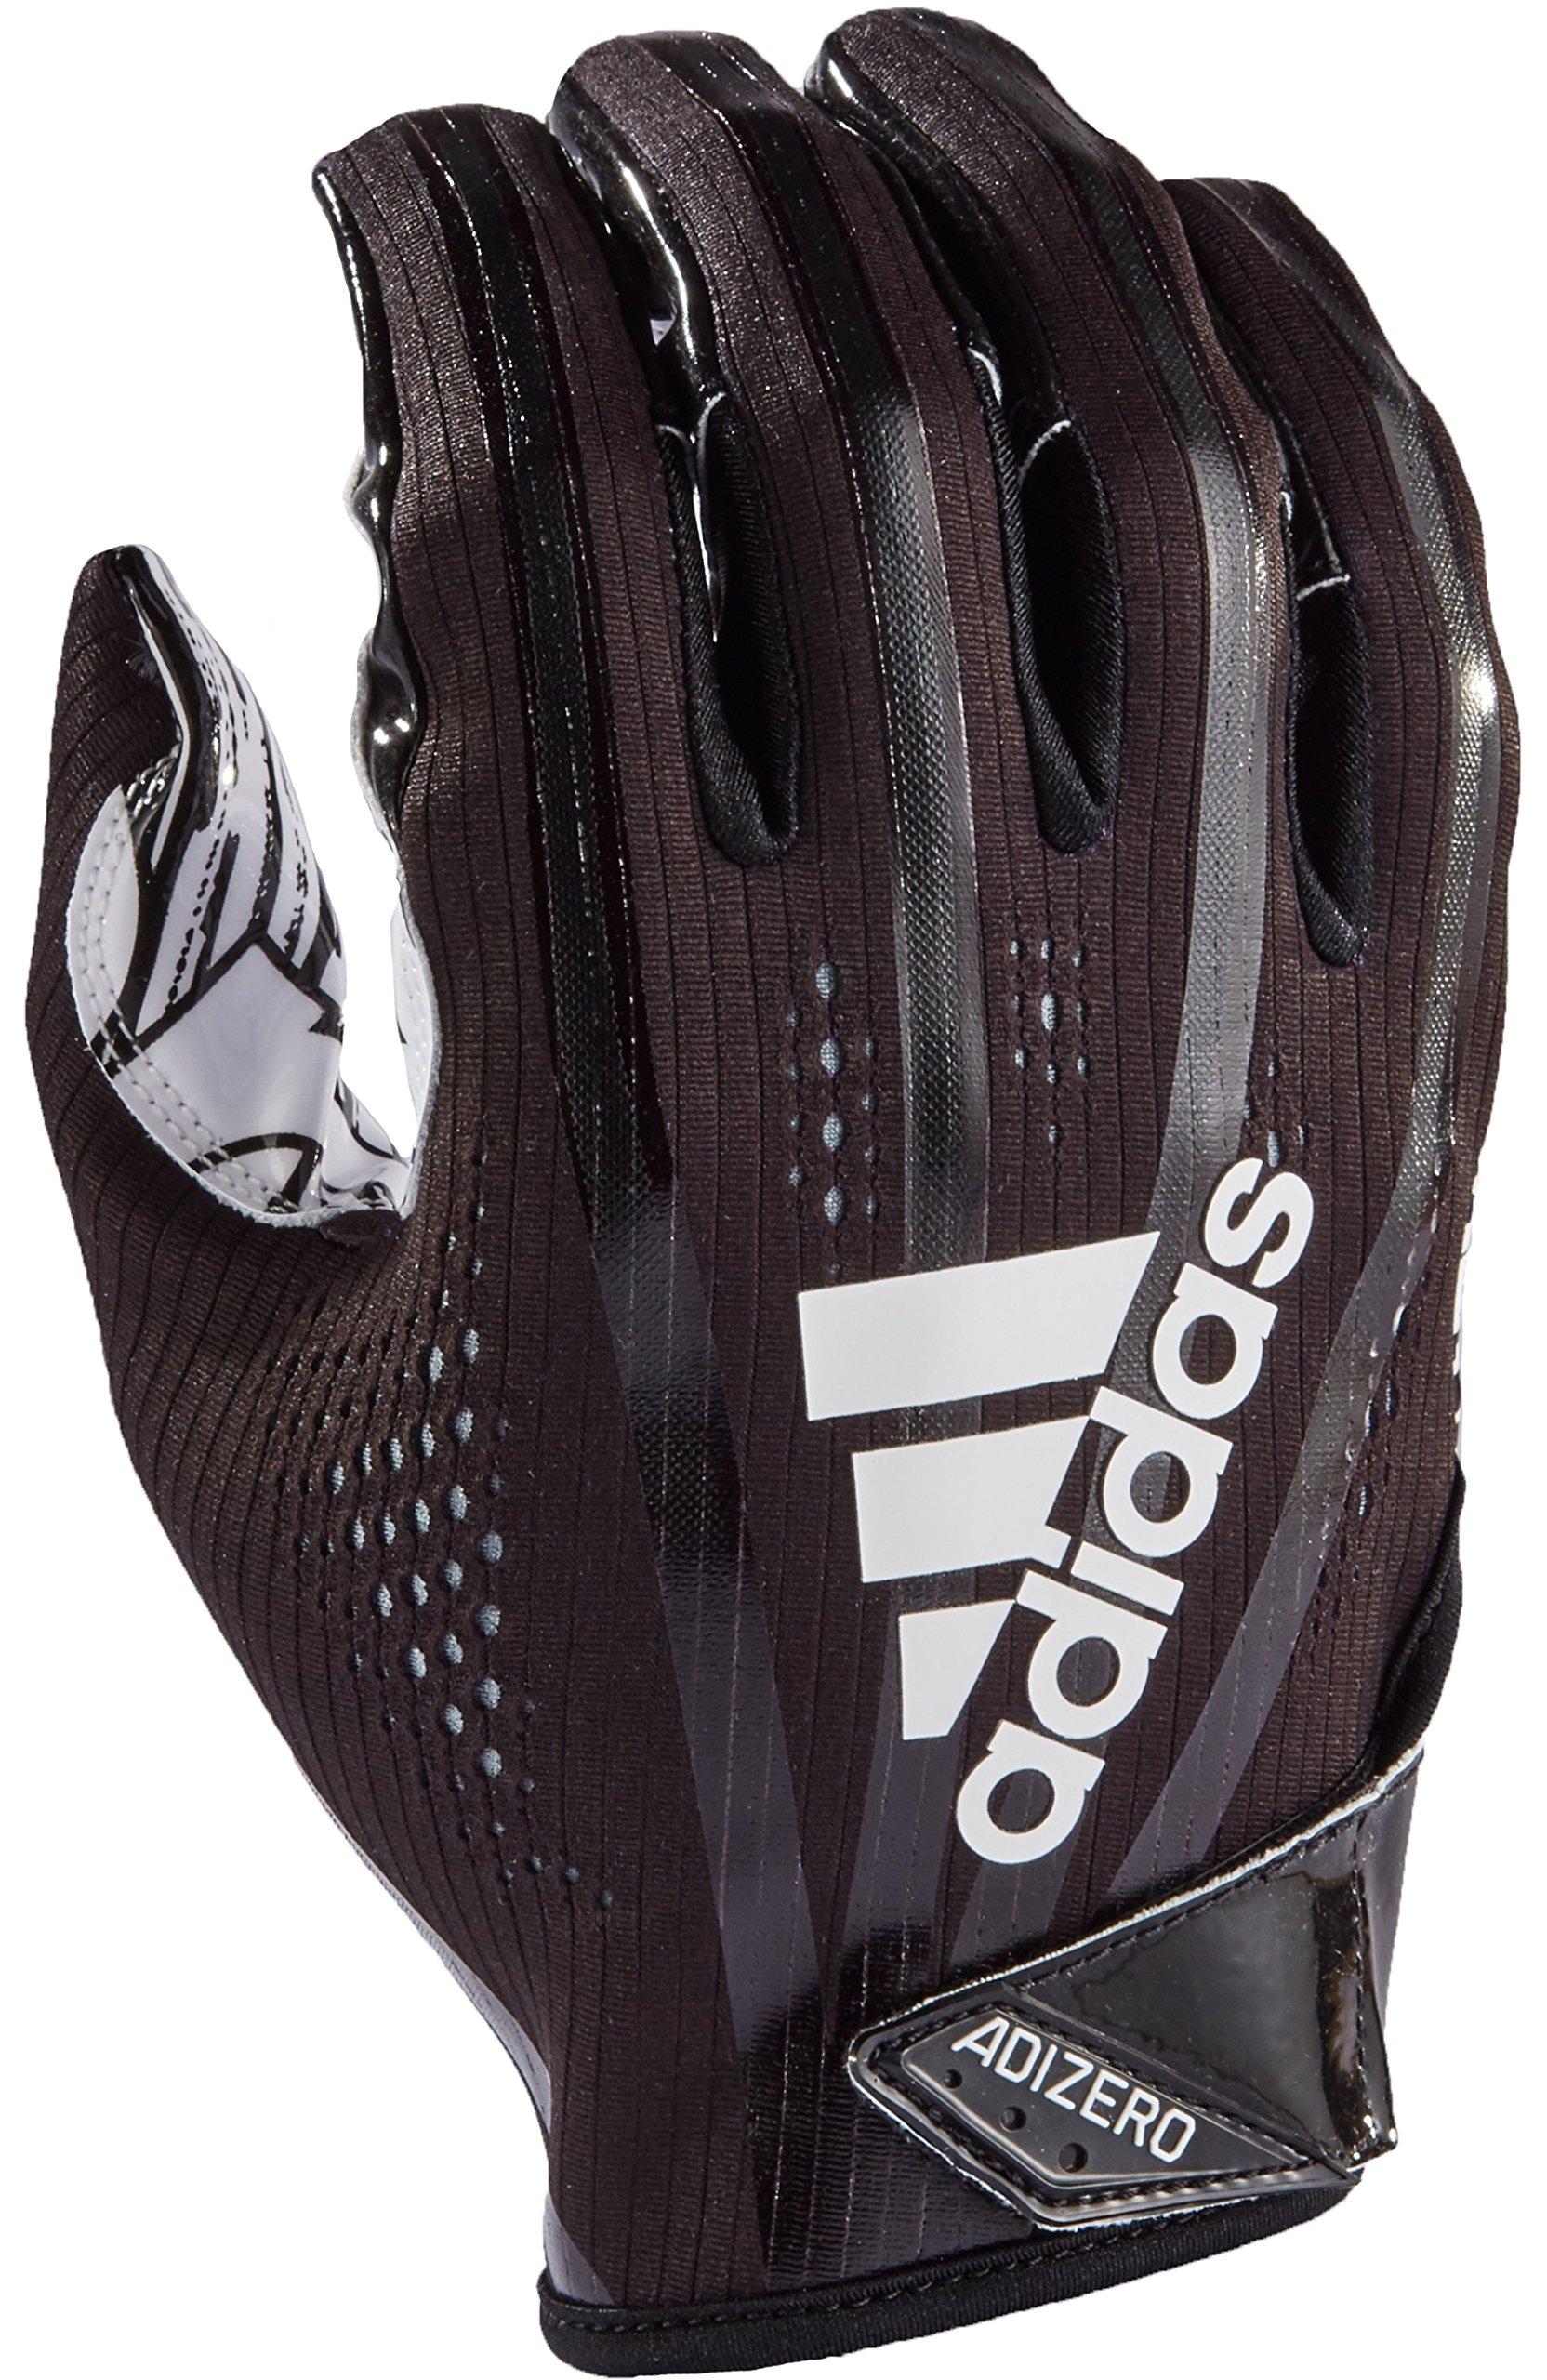 adidas AF1000 Adizero 7.0 Receiver's Gloves, Black, XX-Large by adidas (Image #1)